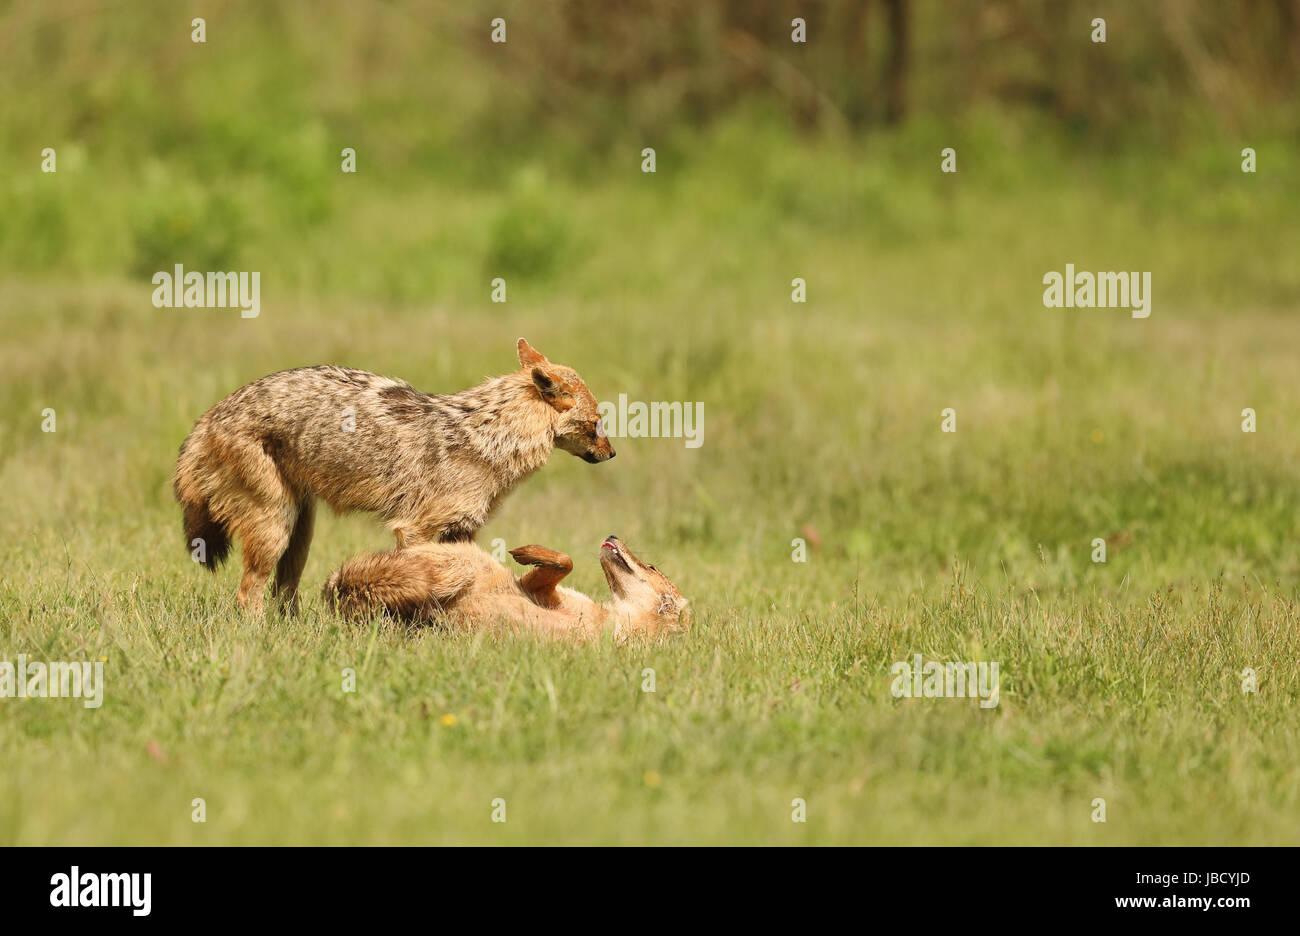 Golden Jackal or European Jackal (Canis aureus) interaction - Stock Image